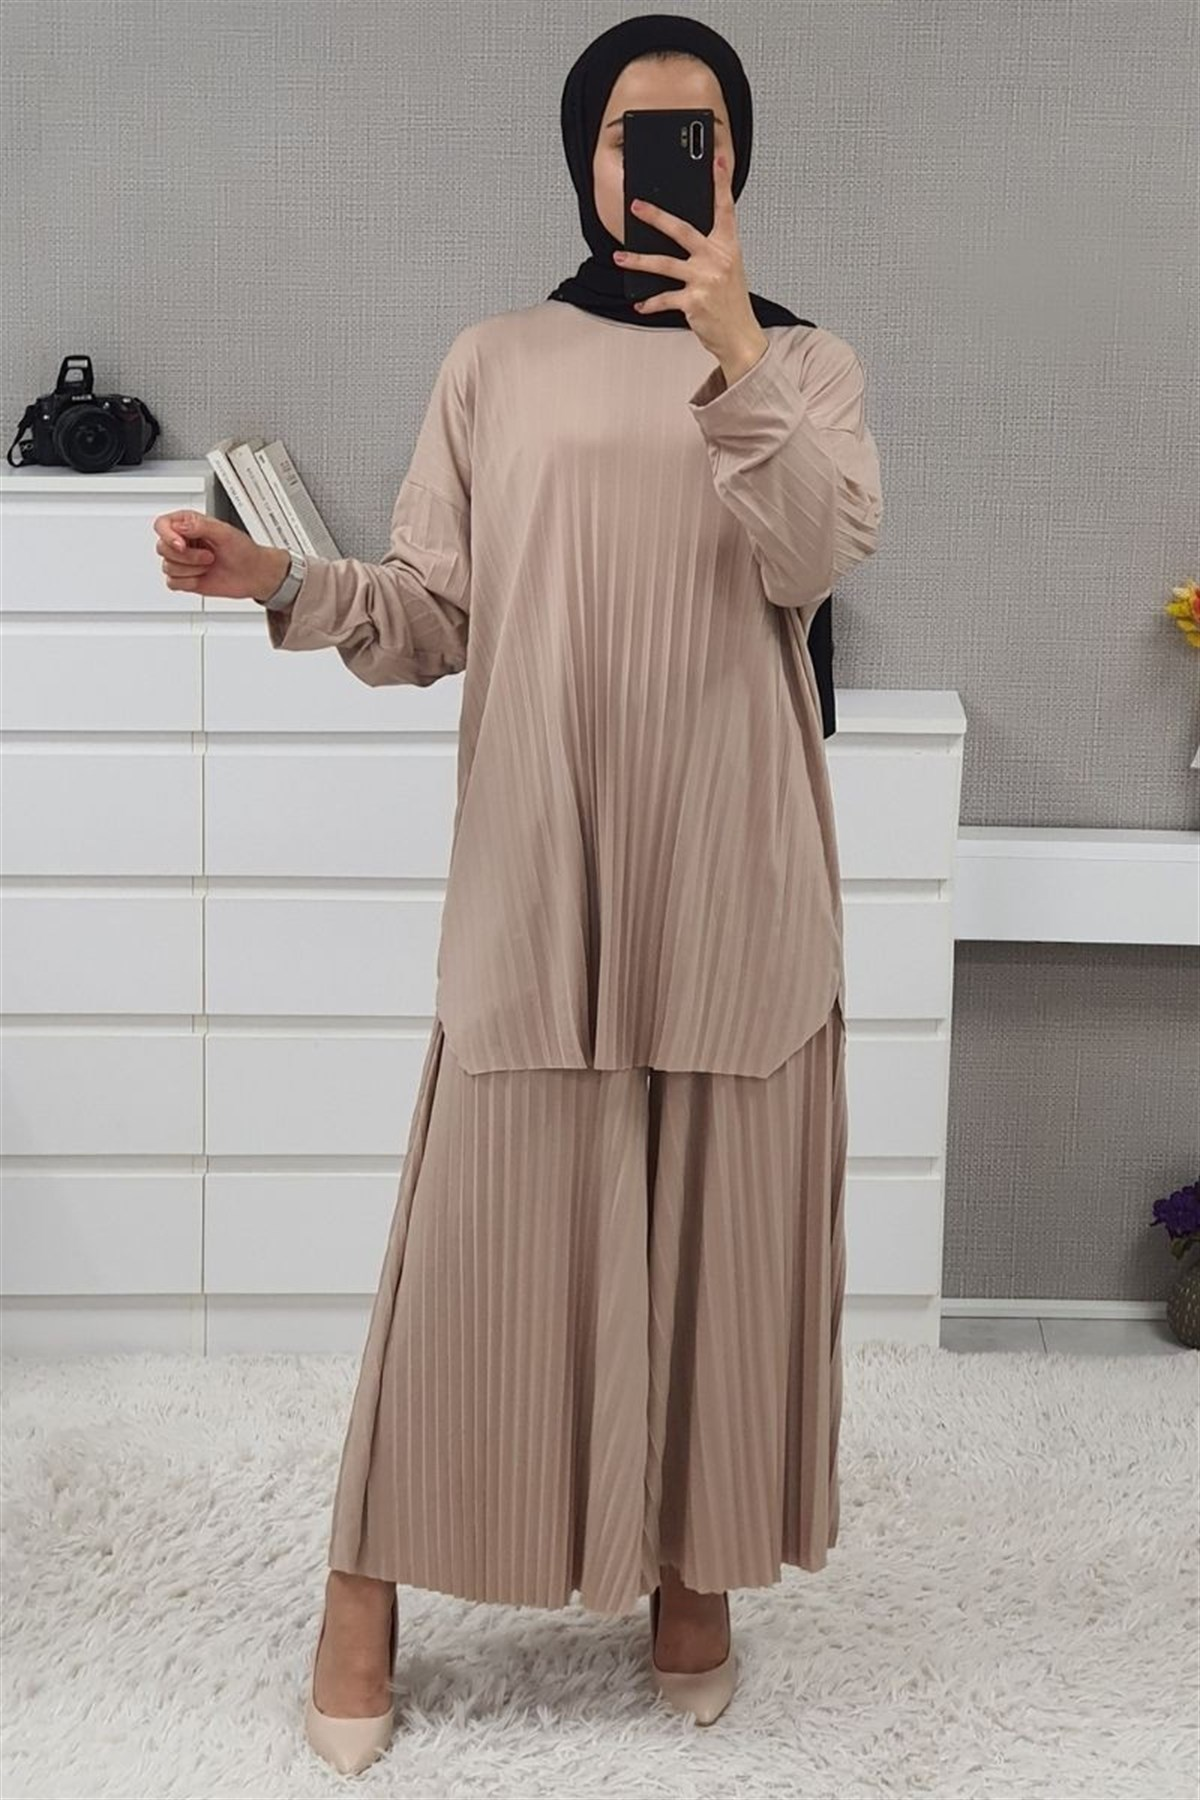 janice apparel kimono